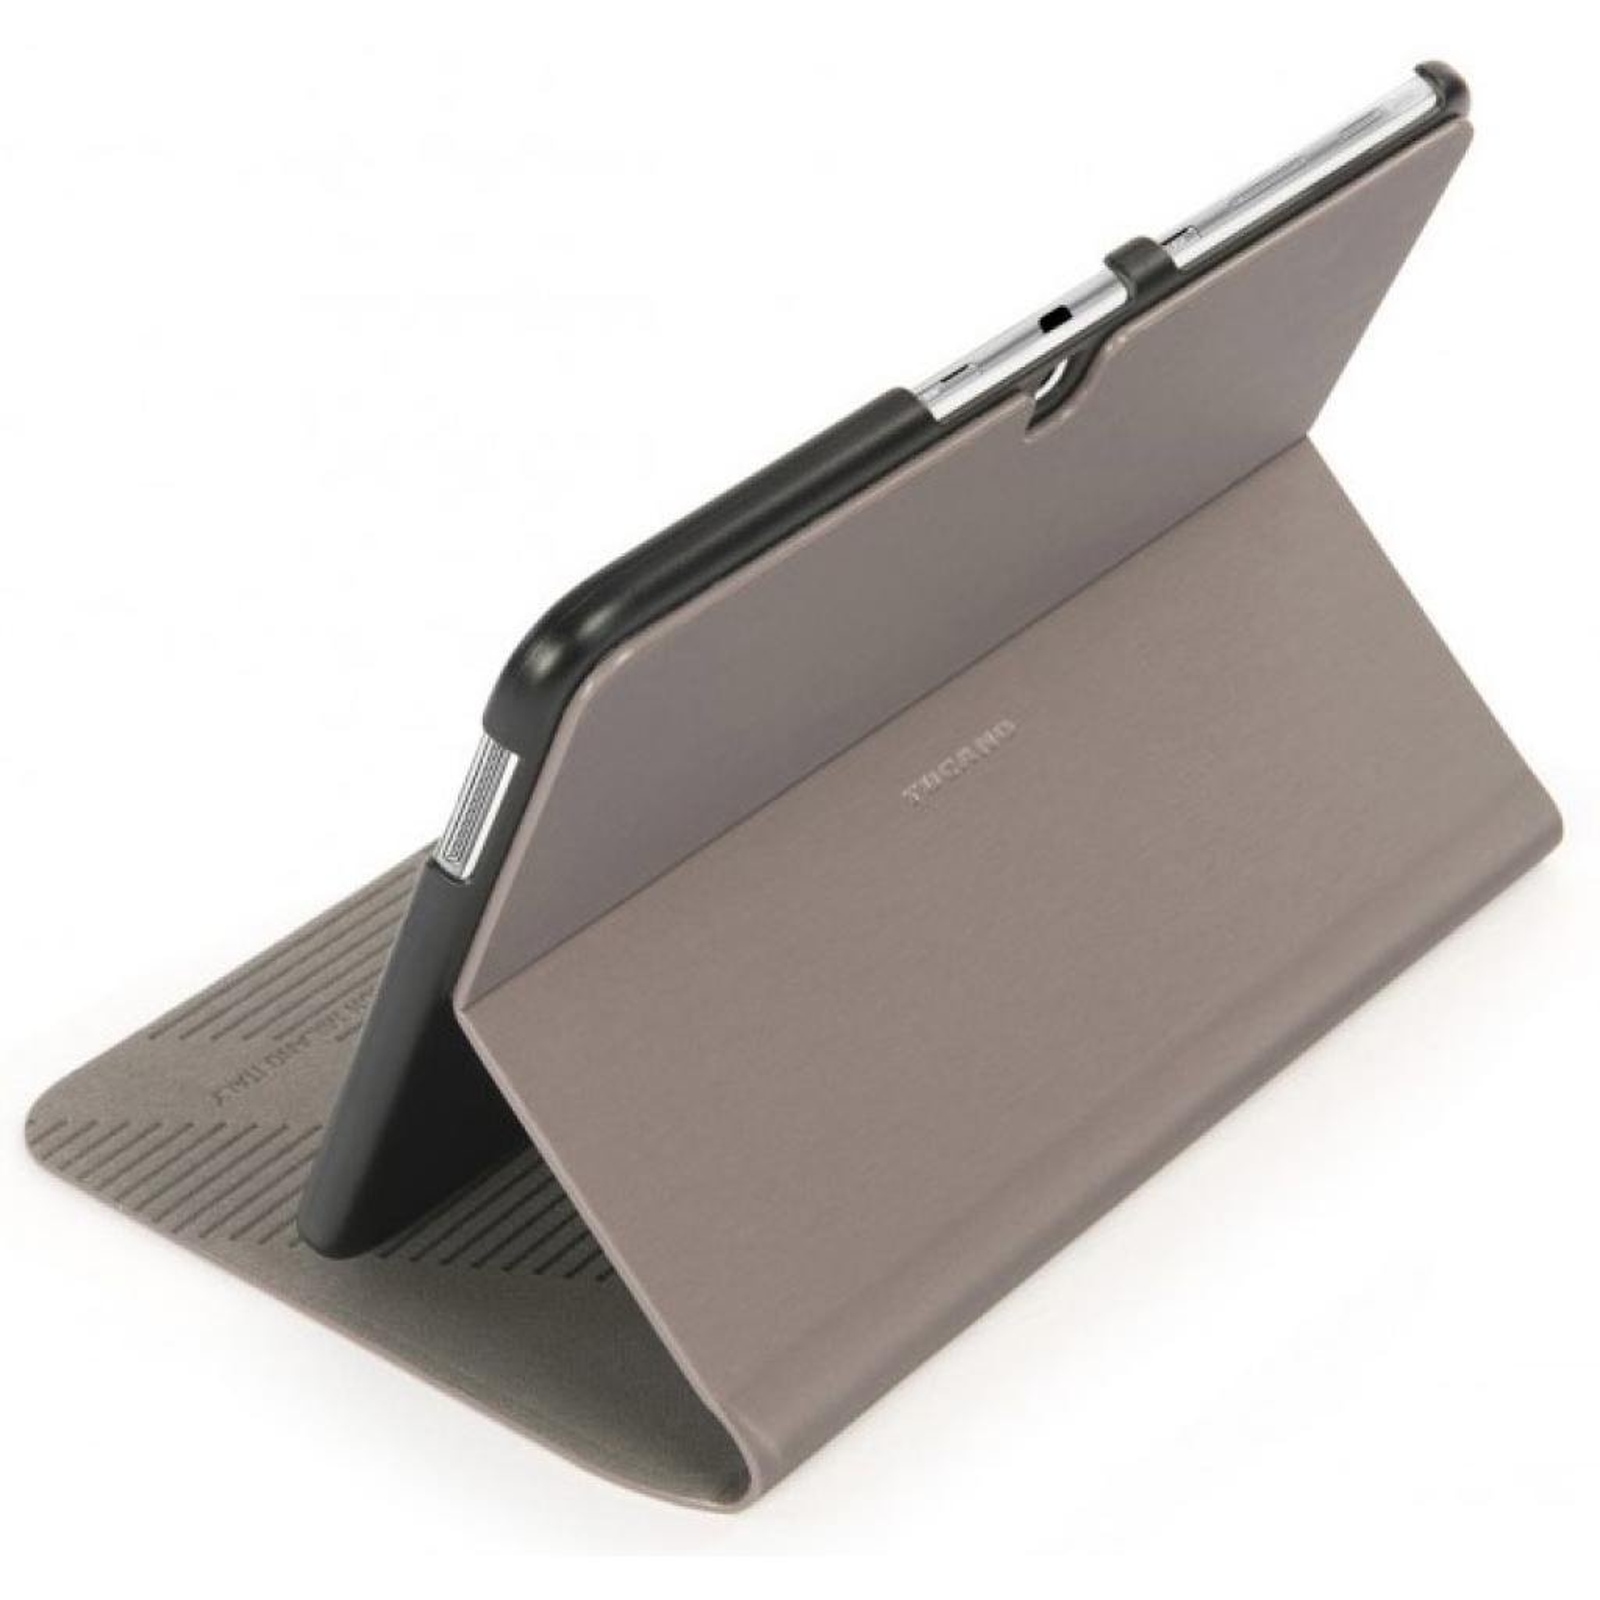 Чехол для планшета Tucano Galaxy Tab3 10.1 Macro (TAB-MS310-G) изображение 7